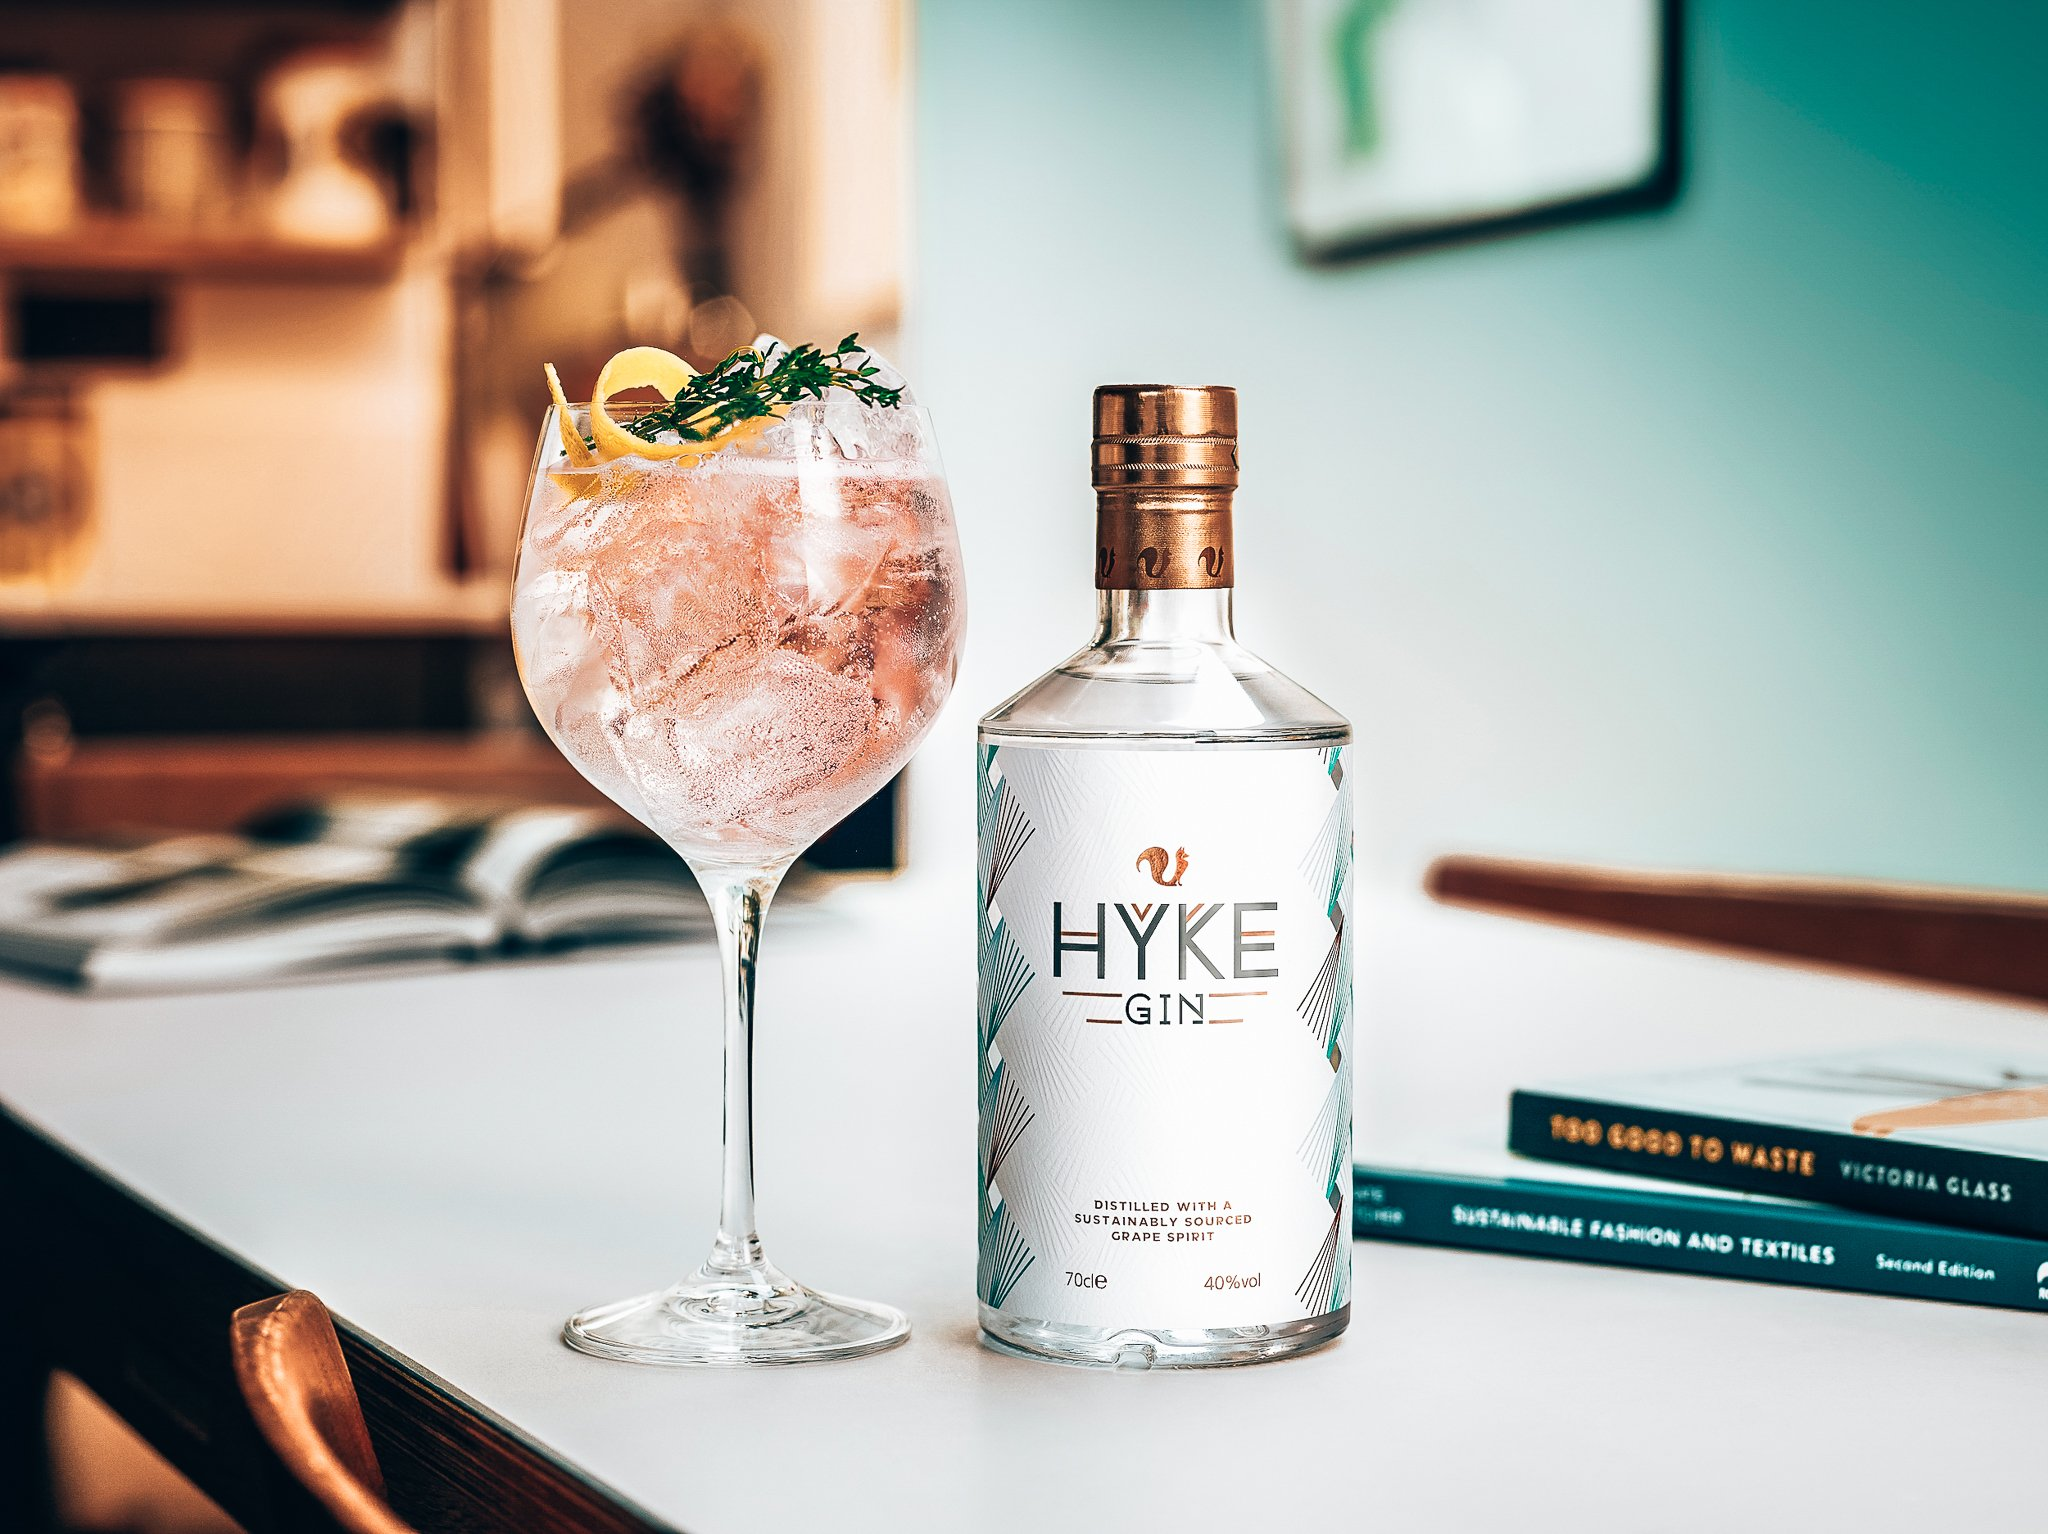 HYKE Spritz, gin cocktail recept met HYKE Gin, Alles over gin.